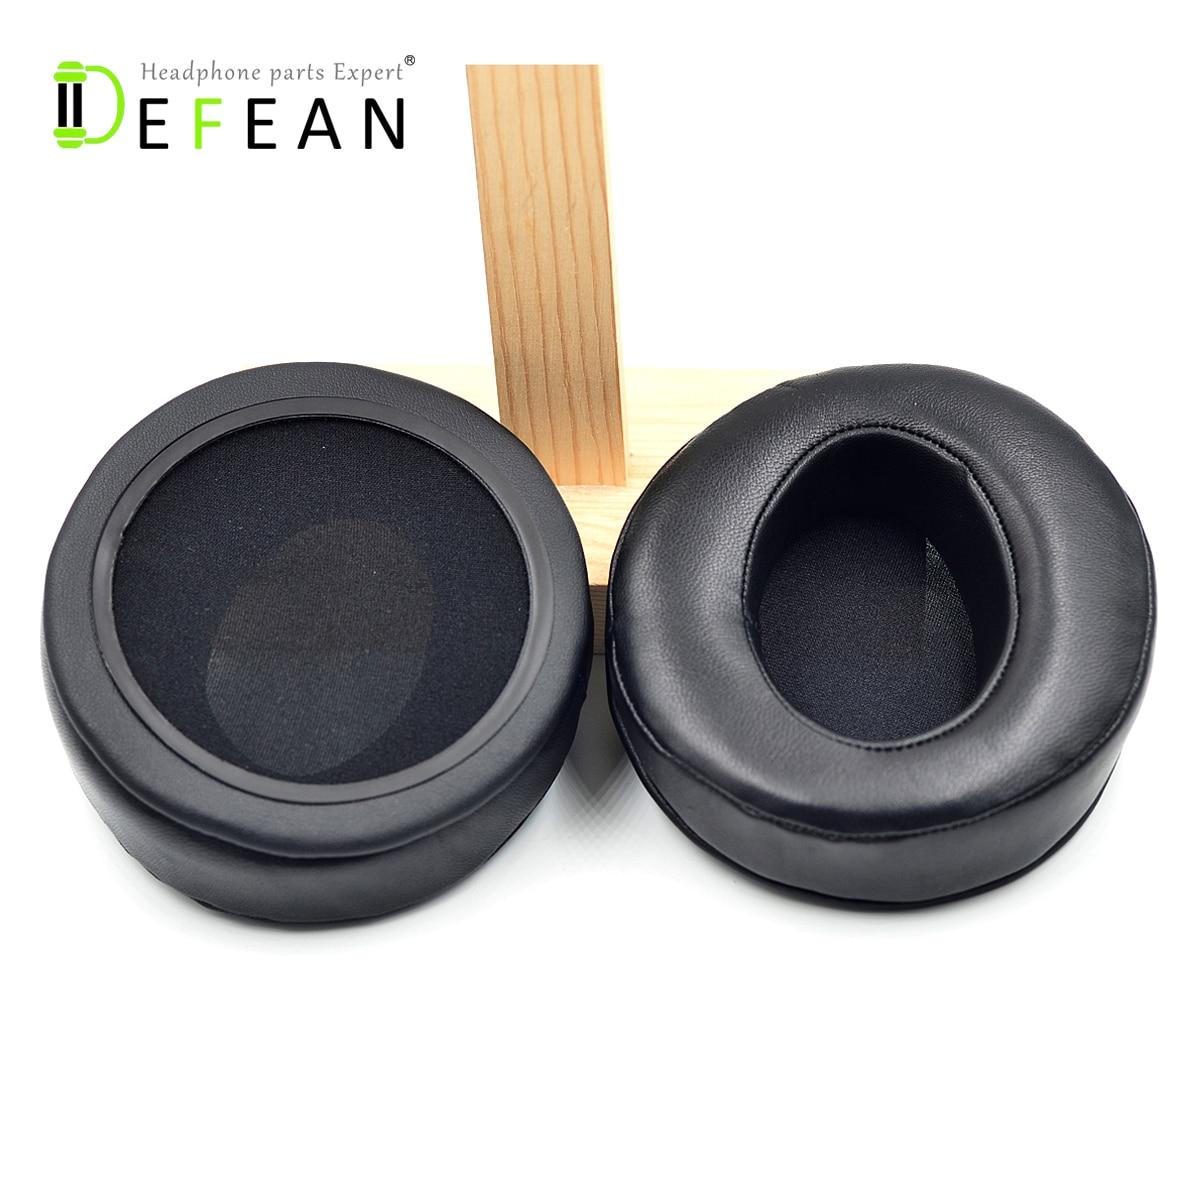 Headphone Jbl Synchros E30 With Microphone Headset Hitam Update Defean Sudut Asli Kulit Bantalan Telinga Bantal Untuk Akg K Series K550 K551 K553